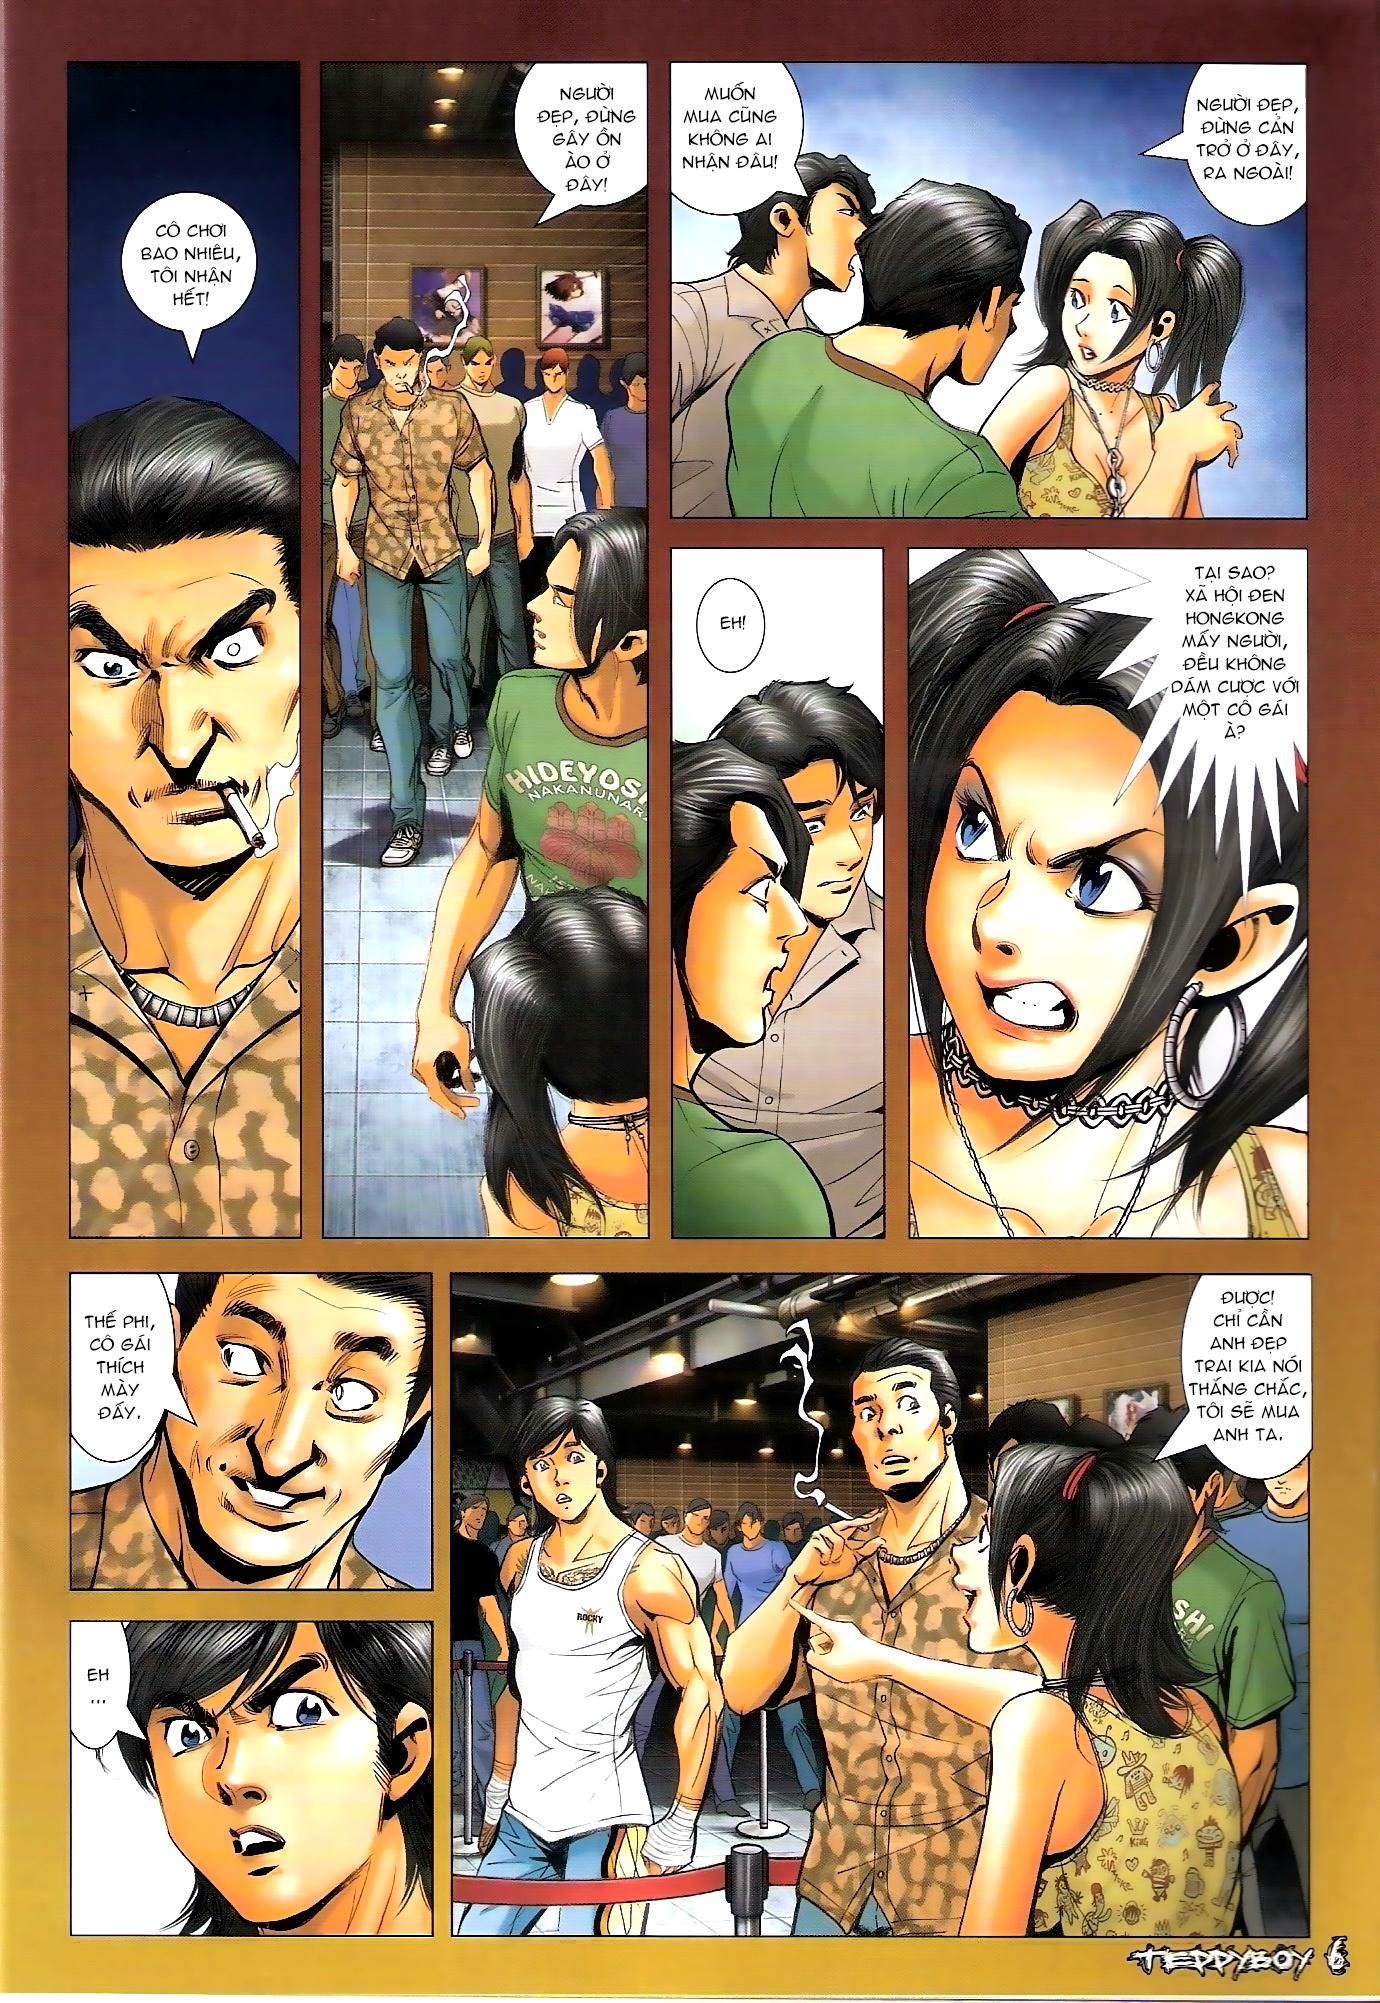 Người Trong Giang Hồ Chap 1291 - Truyen.Chap.VN